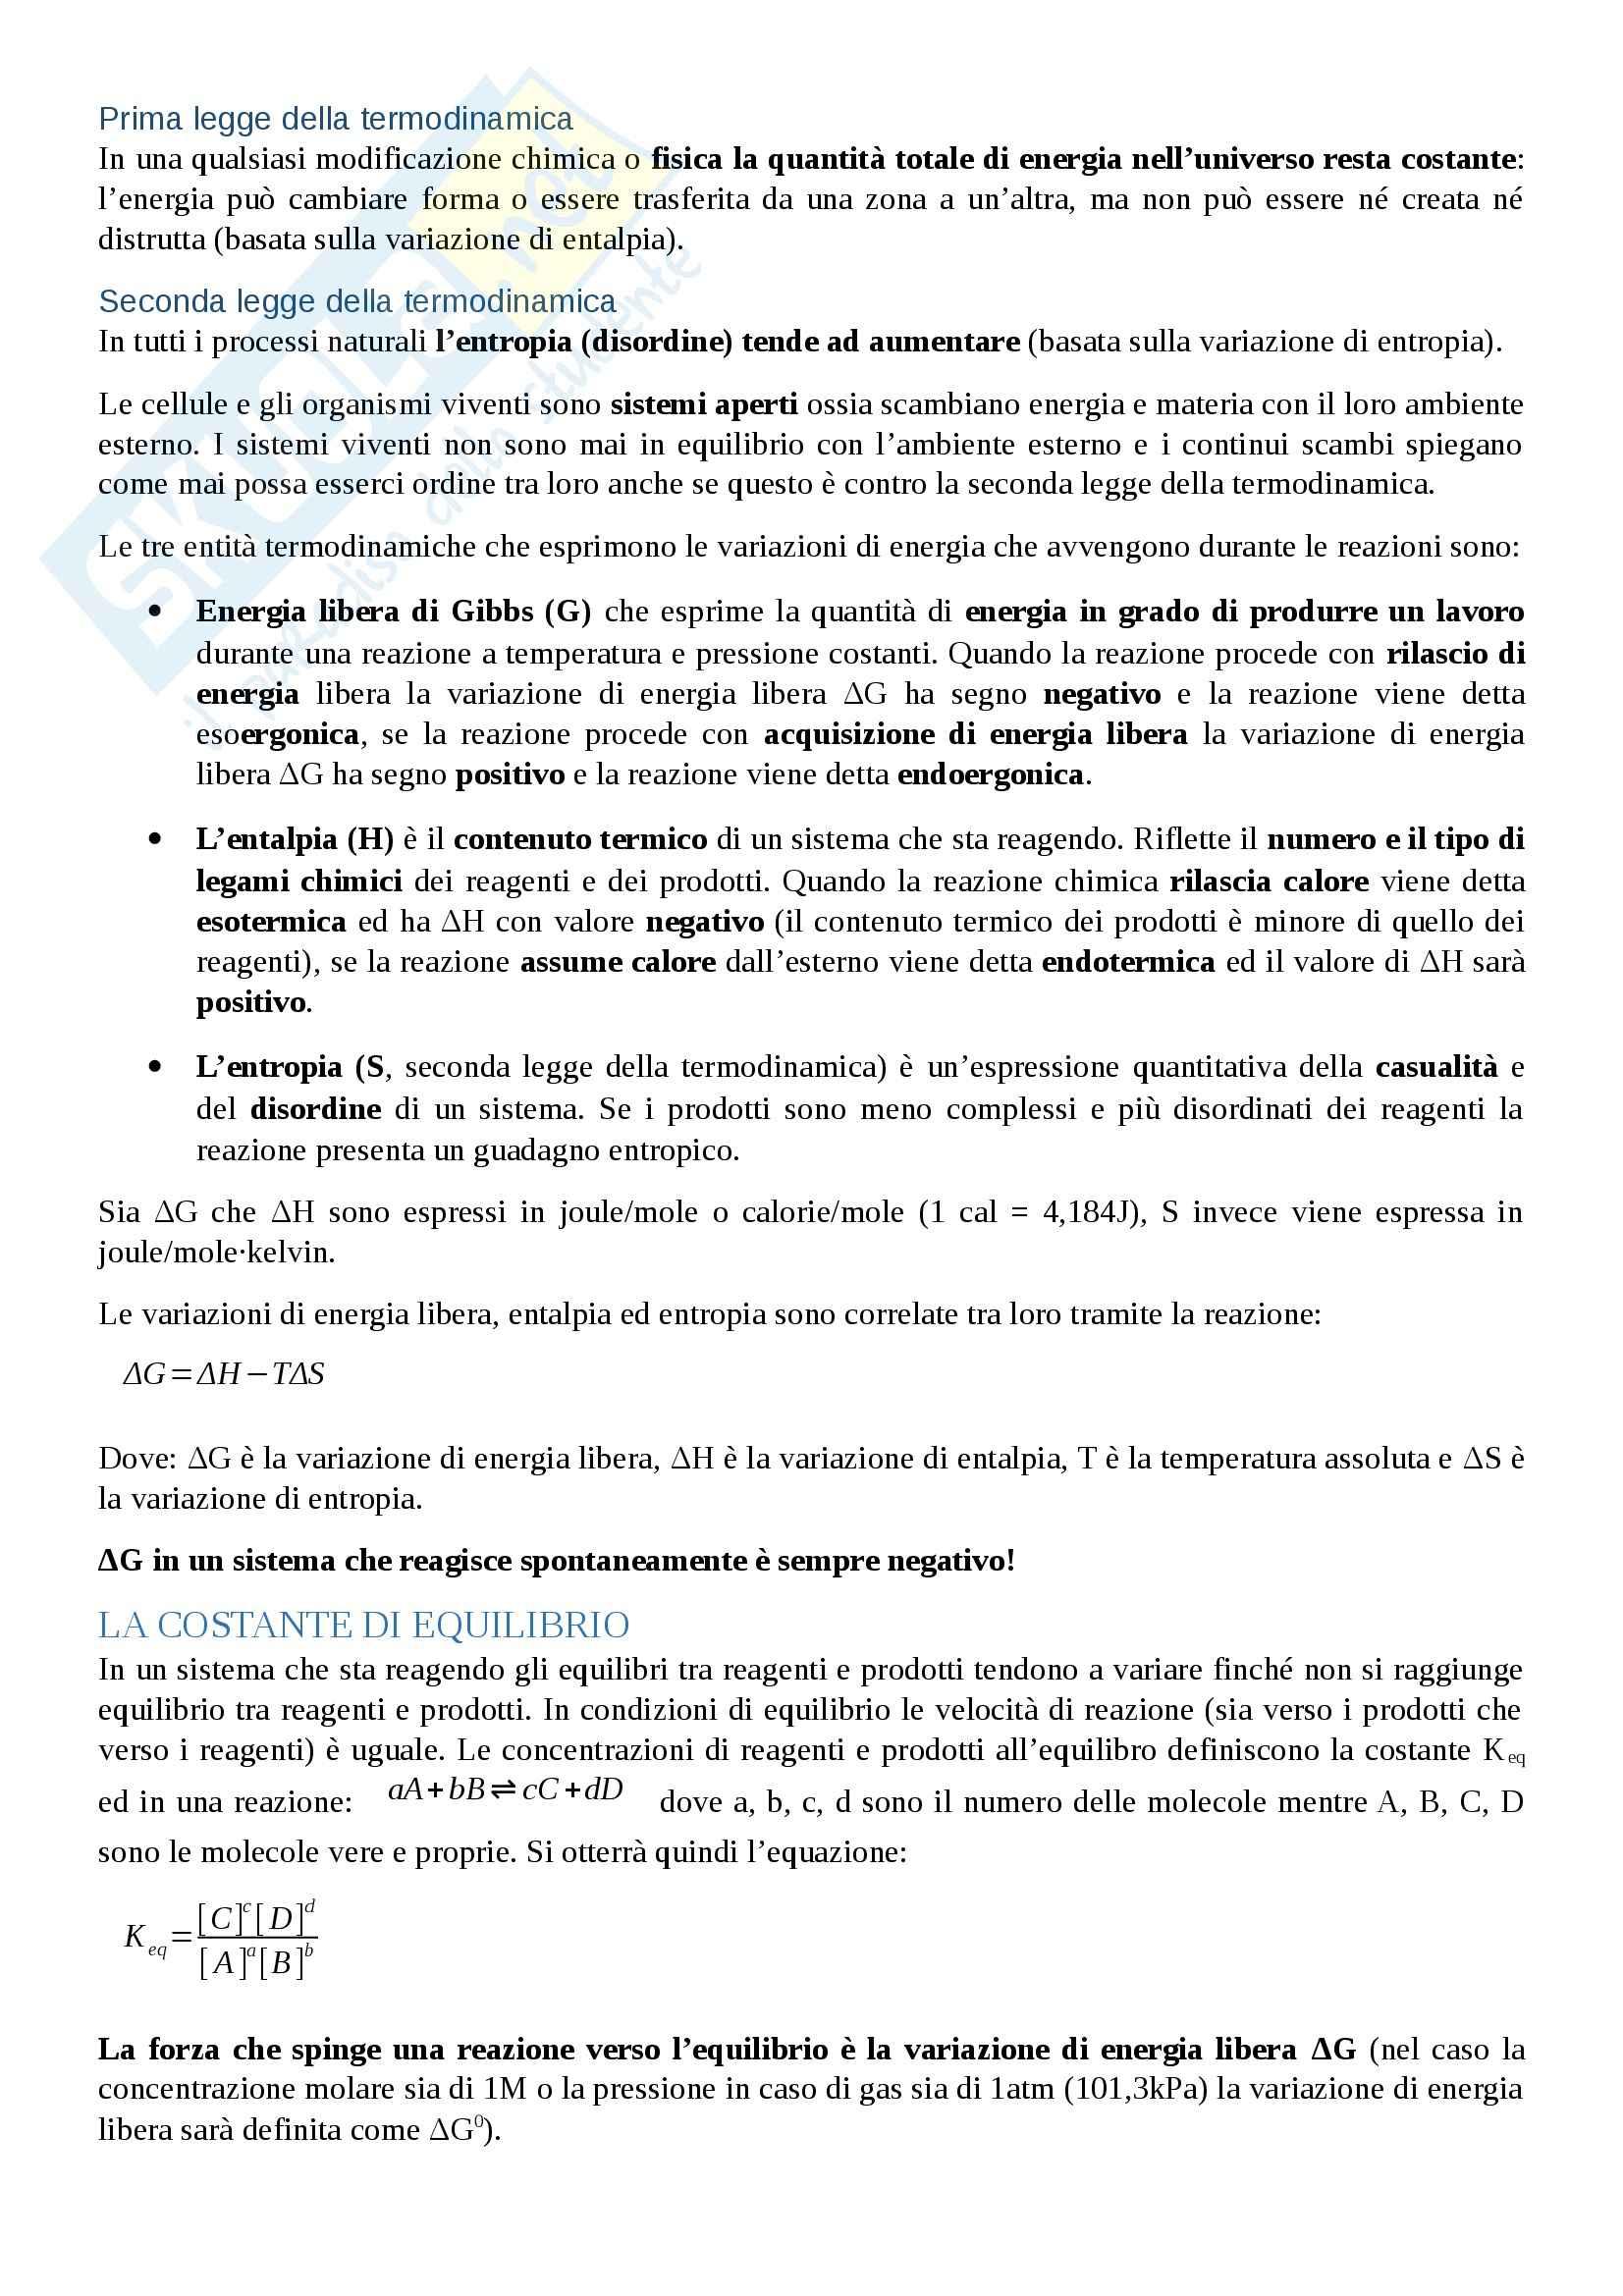 Biochimica - metabolismo cellulare Pag. 2